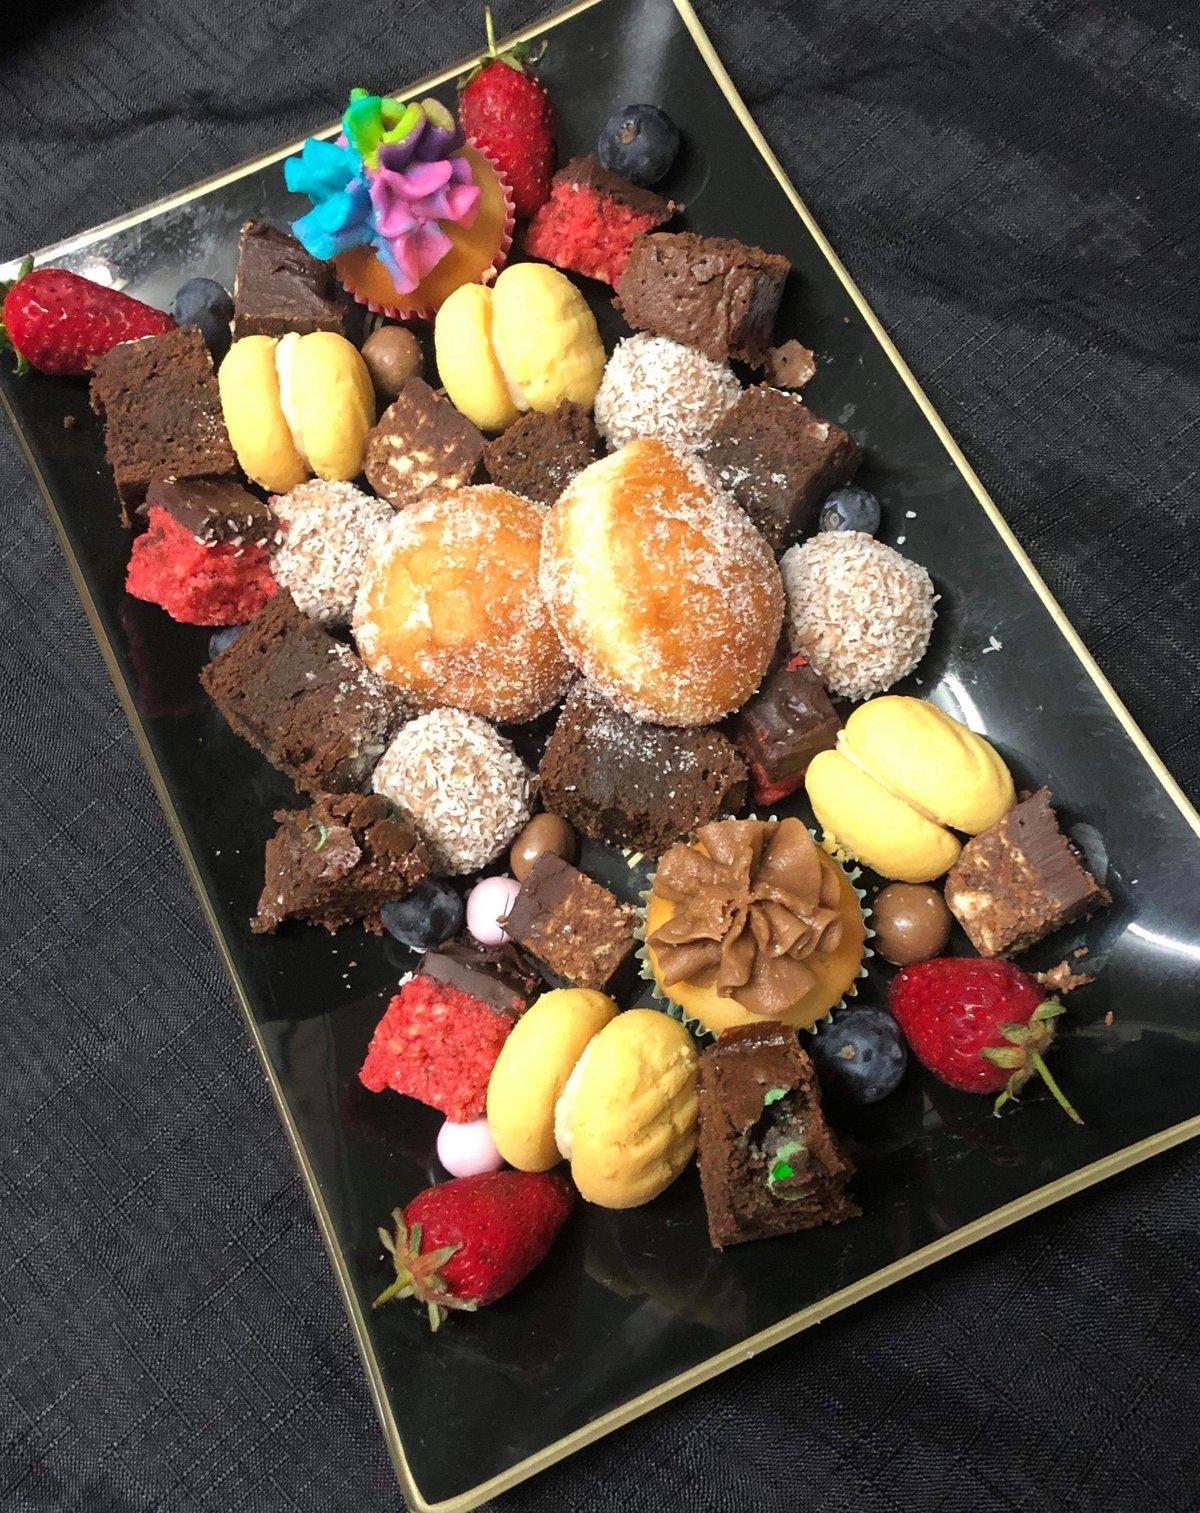 Image of Dessert Platter